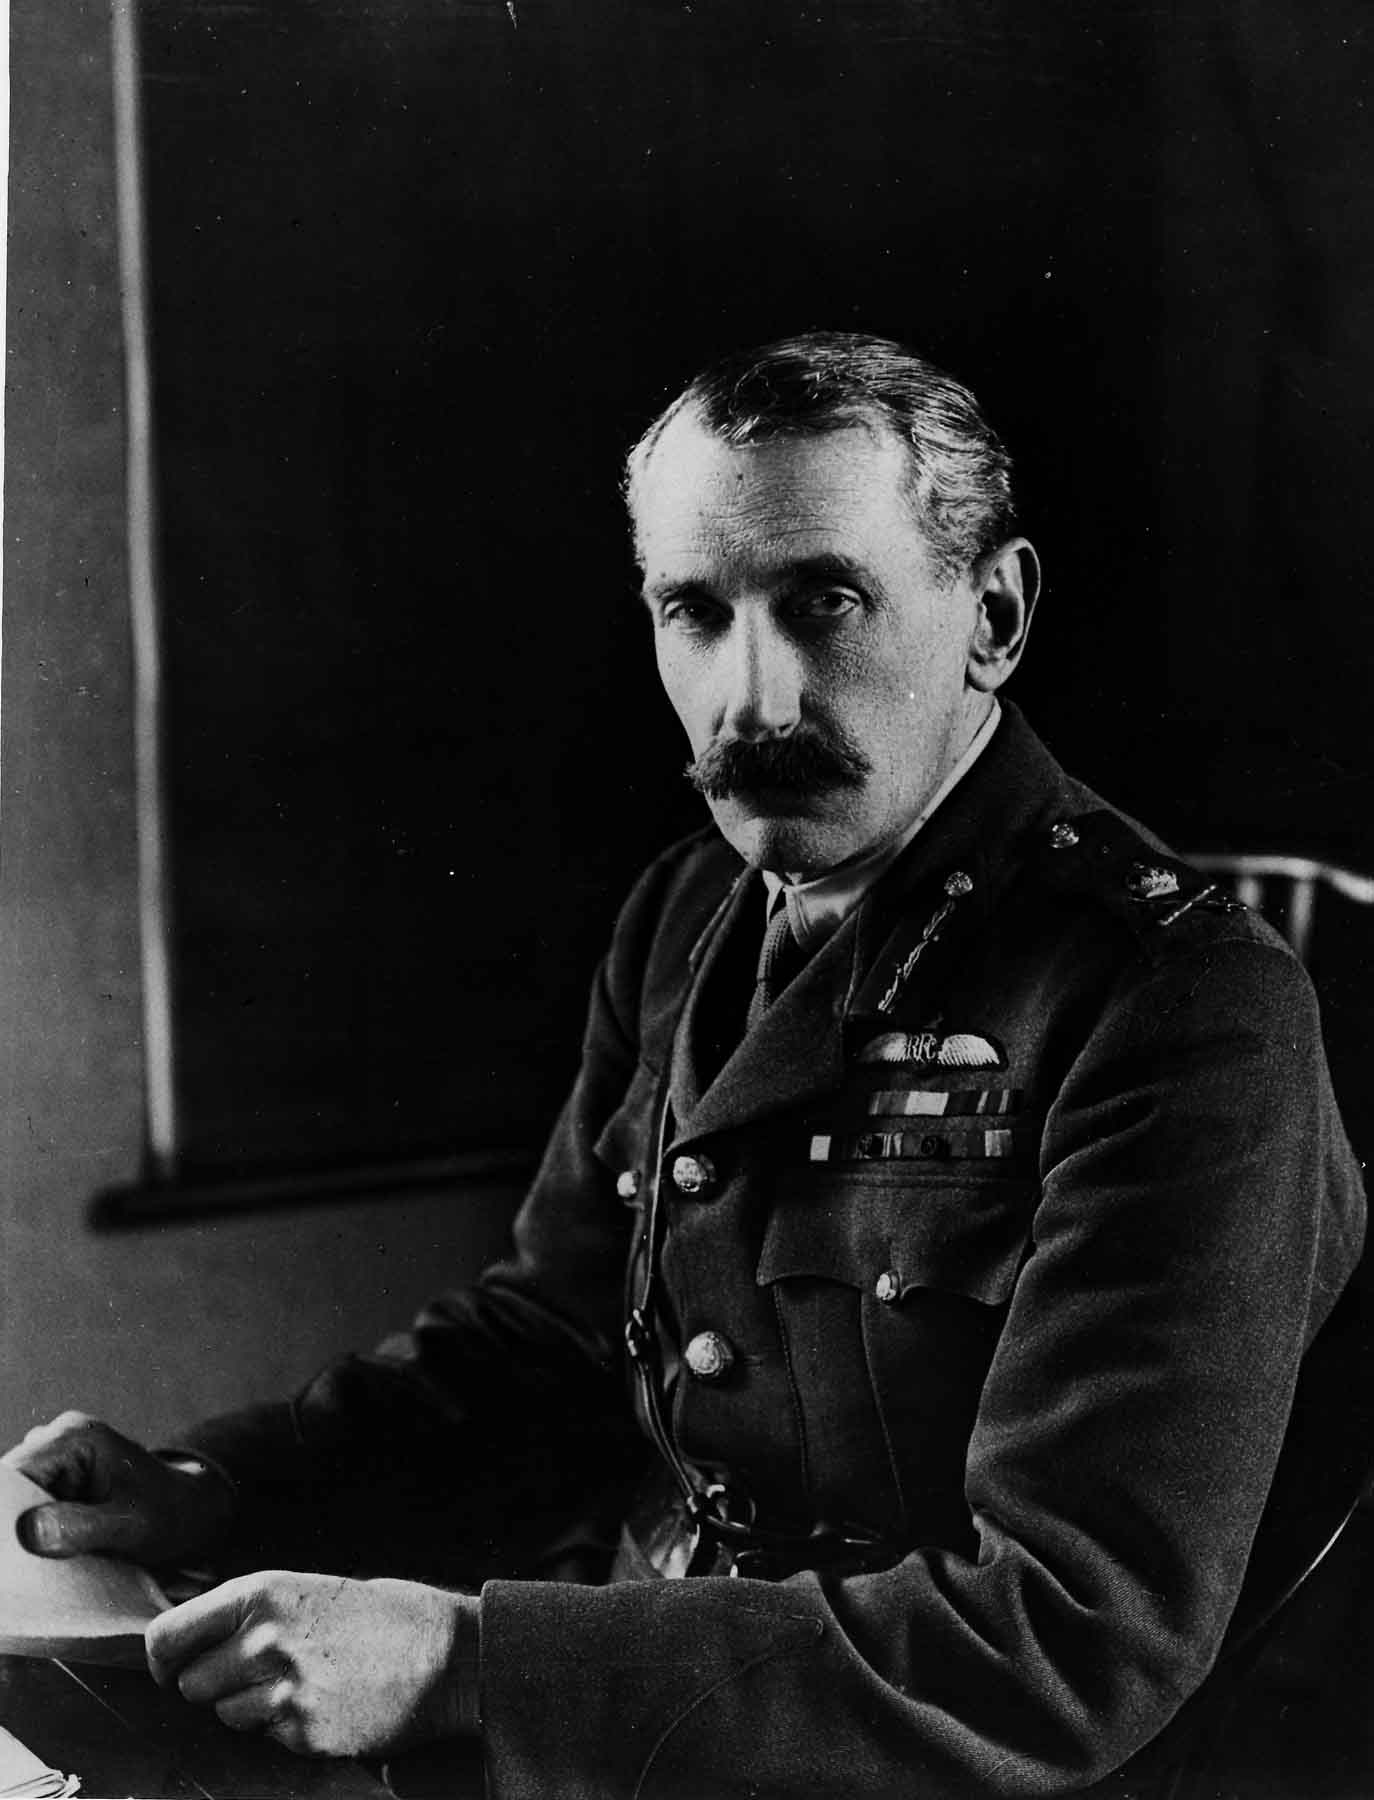 PC71/19/81 Sir David Henderson, Commander of the RFC, ca. 1915.